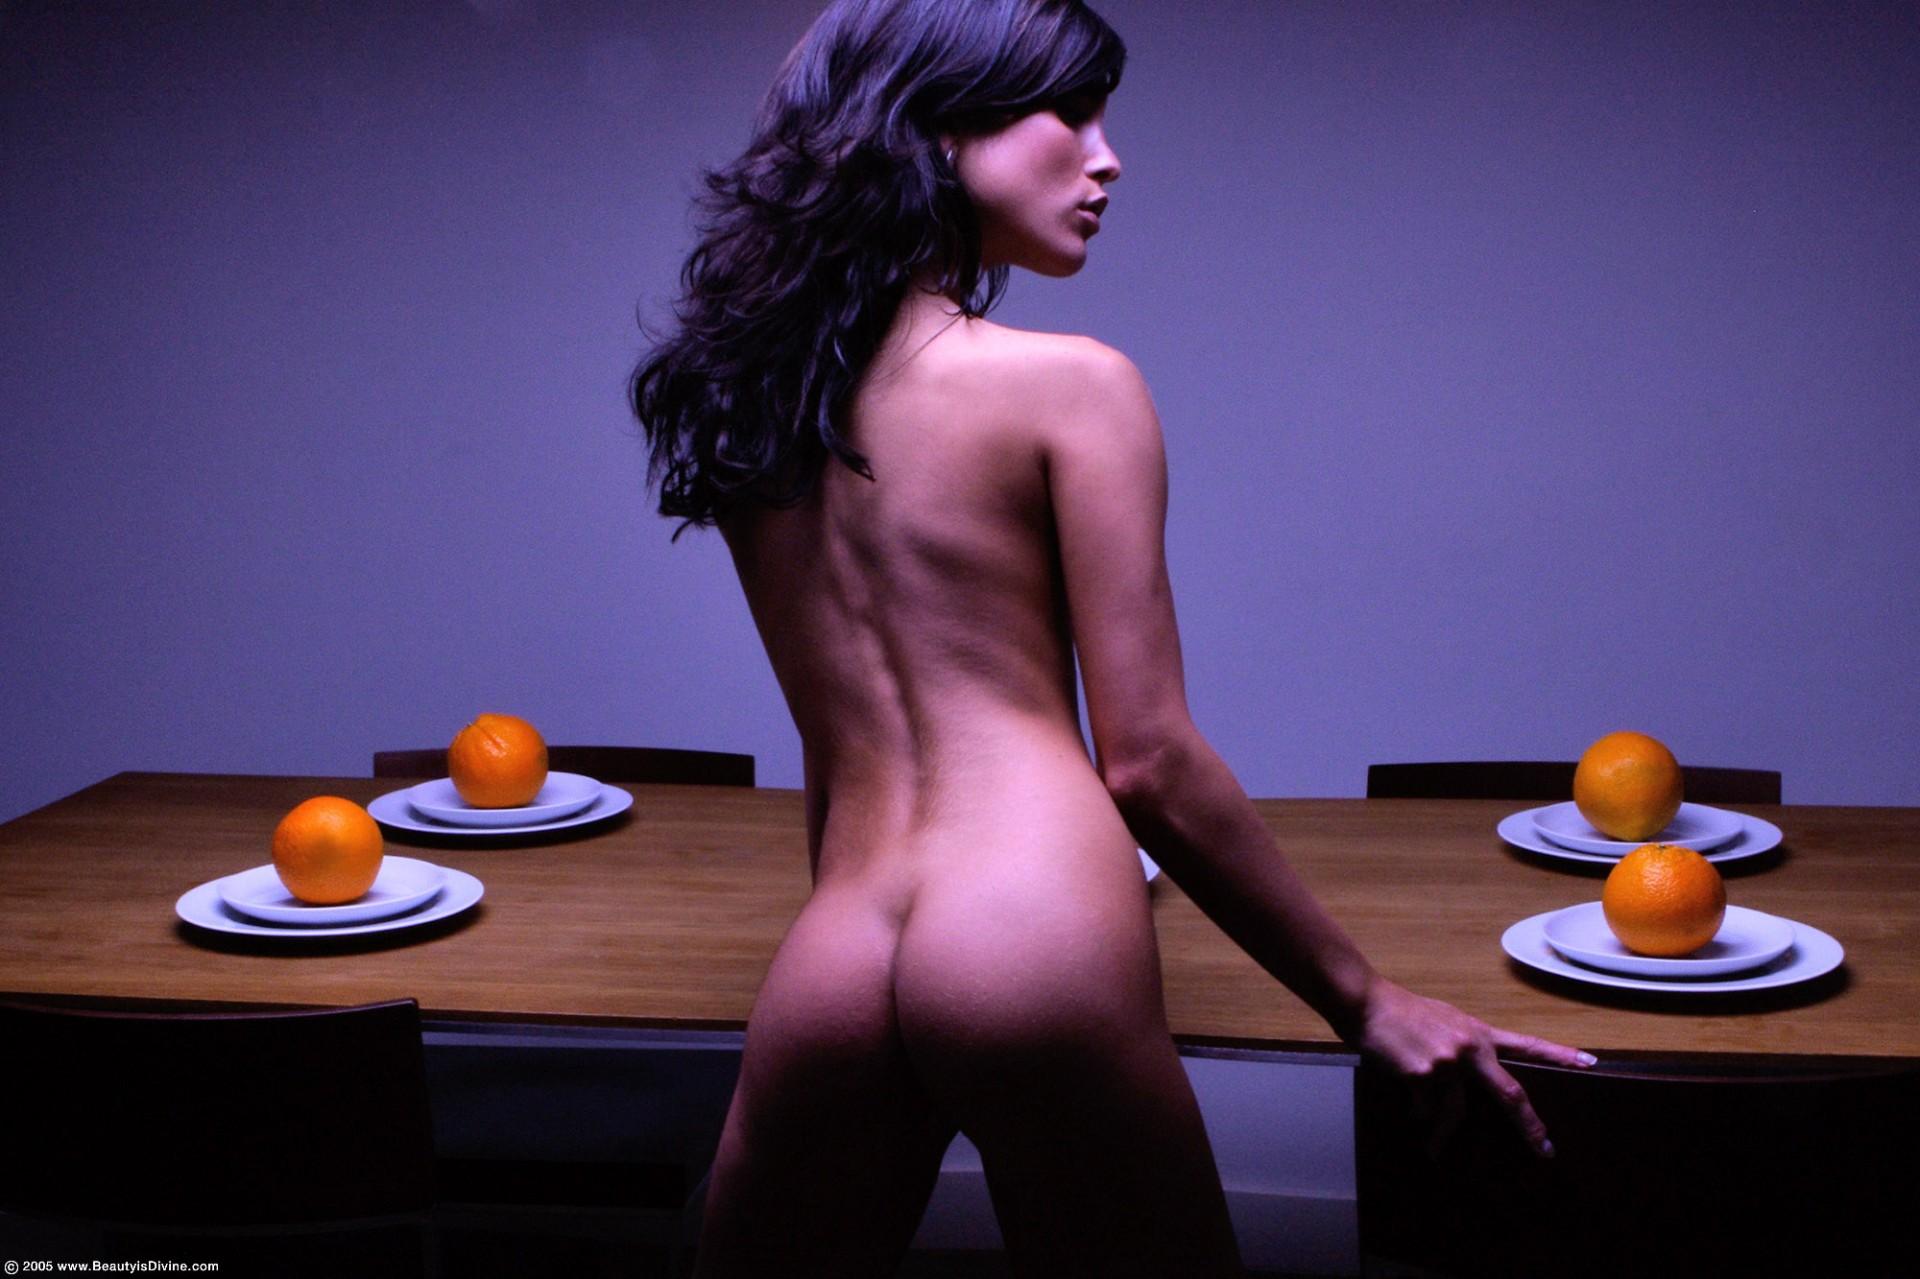 Жопа в апельсинах онлайн теле девушках